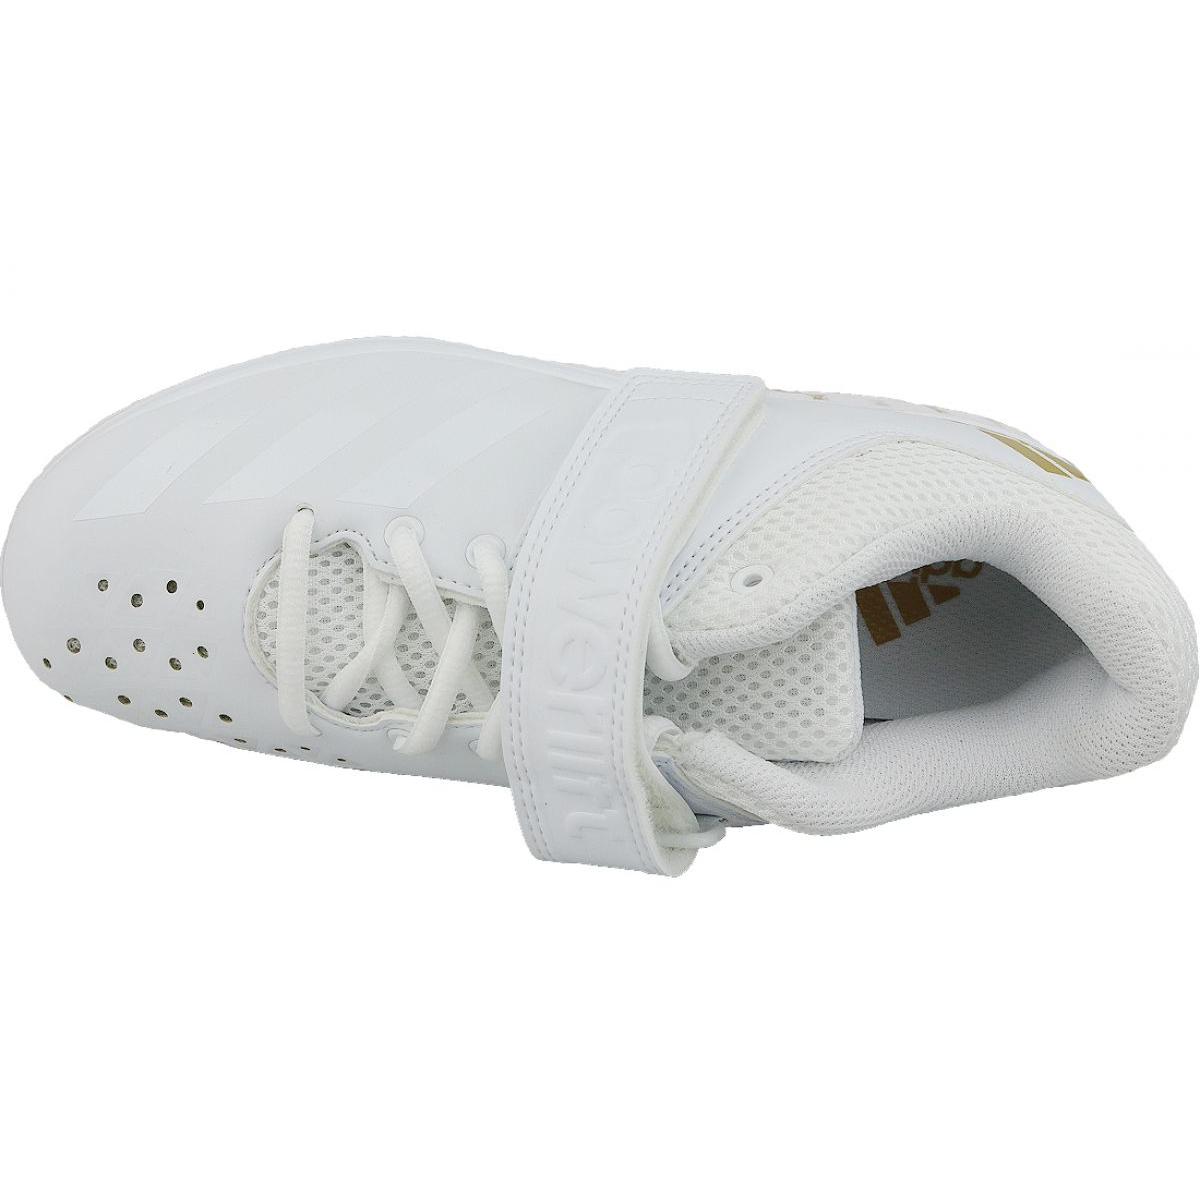 Blanco Zapatillas Adidas Powerlift.3.1 W AC7467